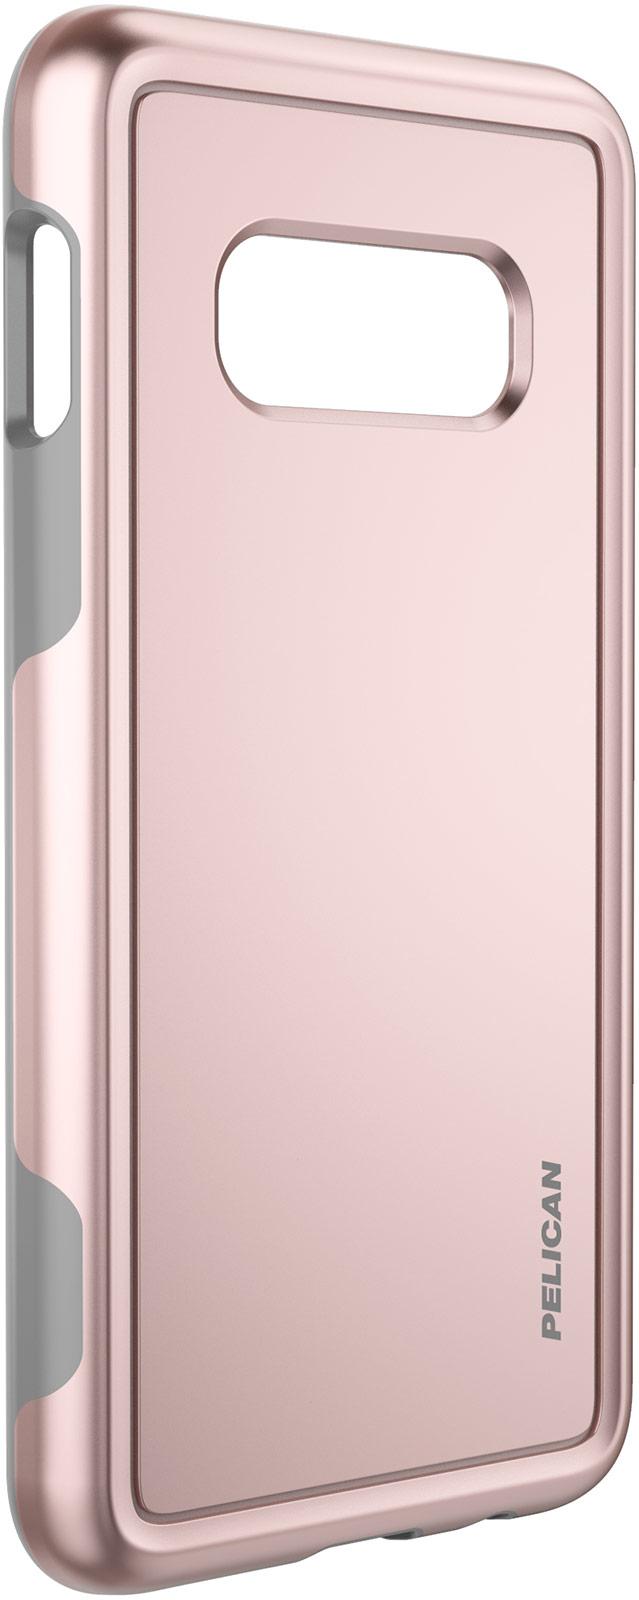 pelican samsung galaxy s10e rose gold phone case